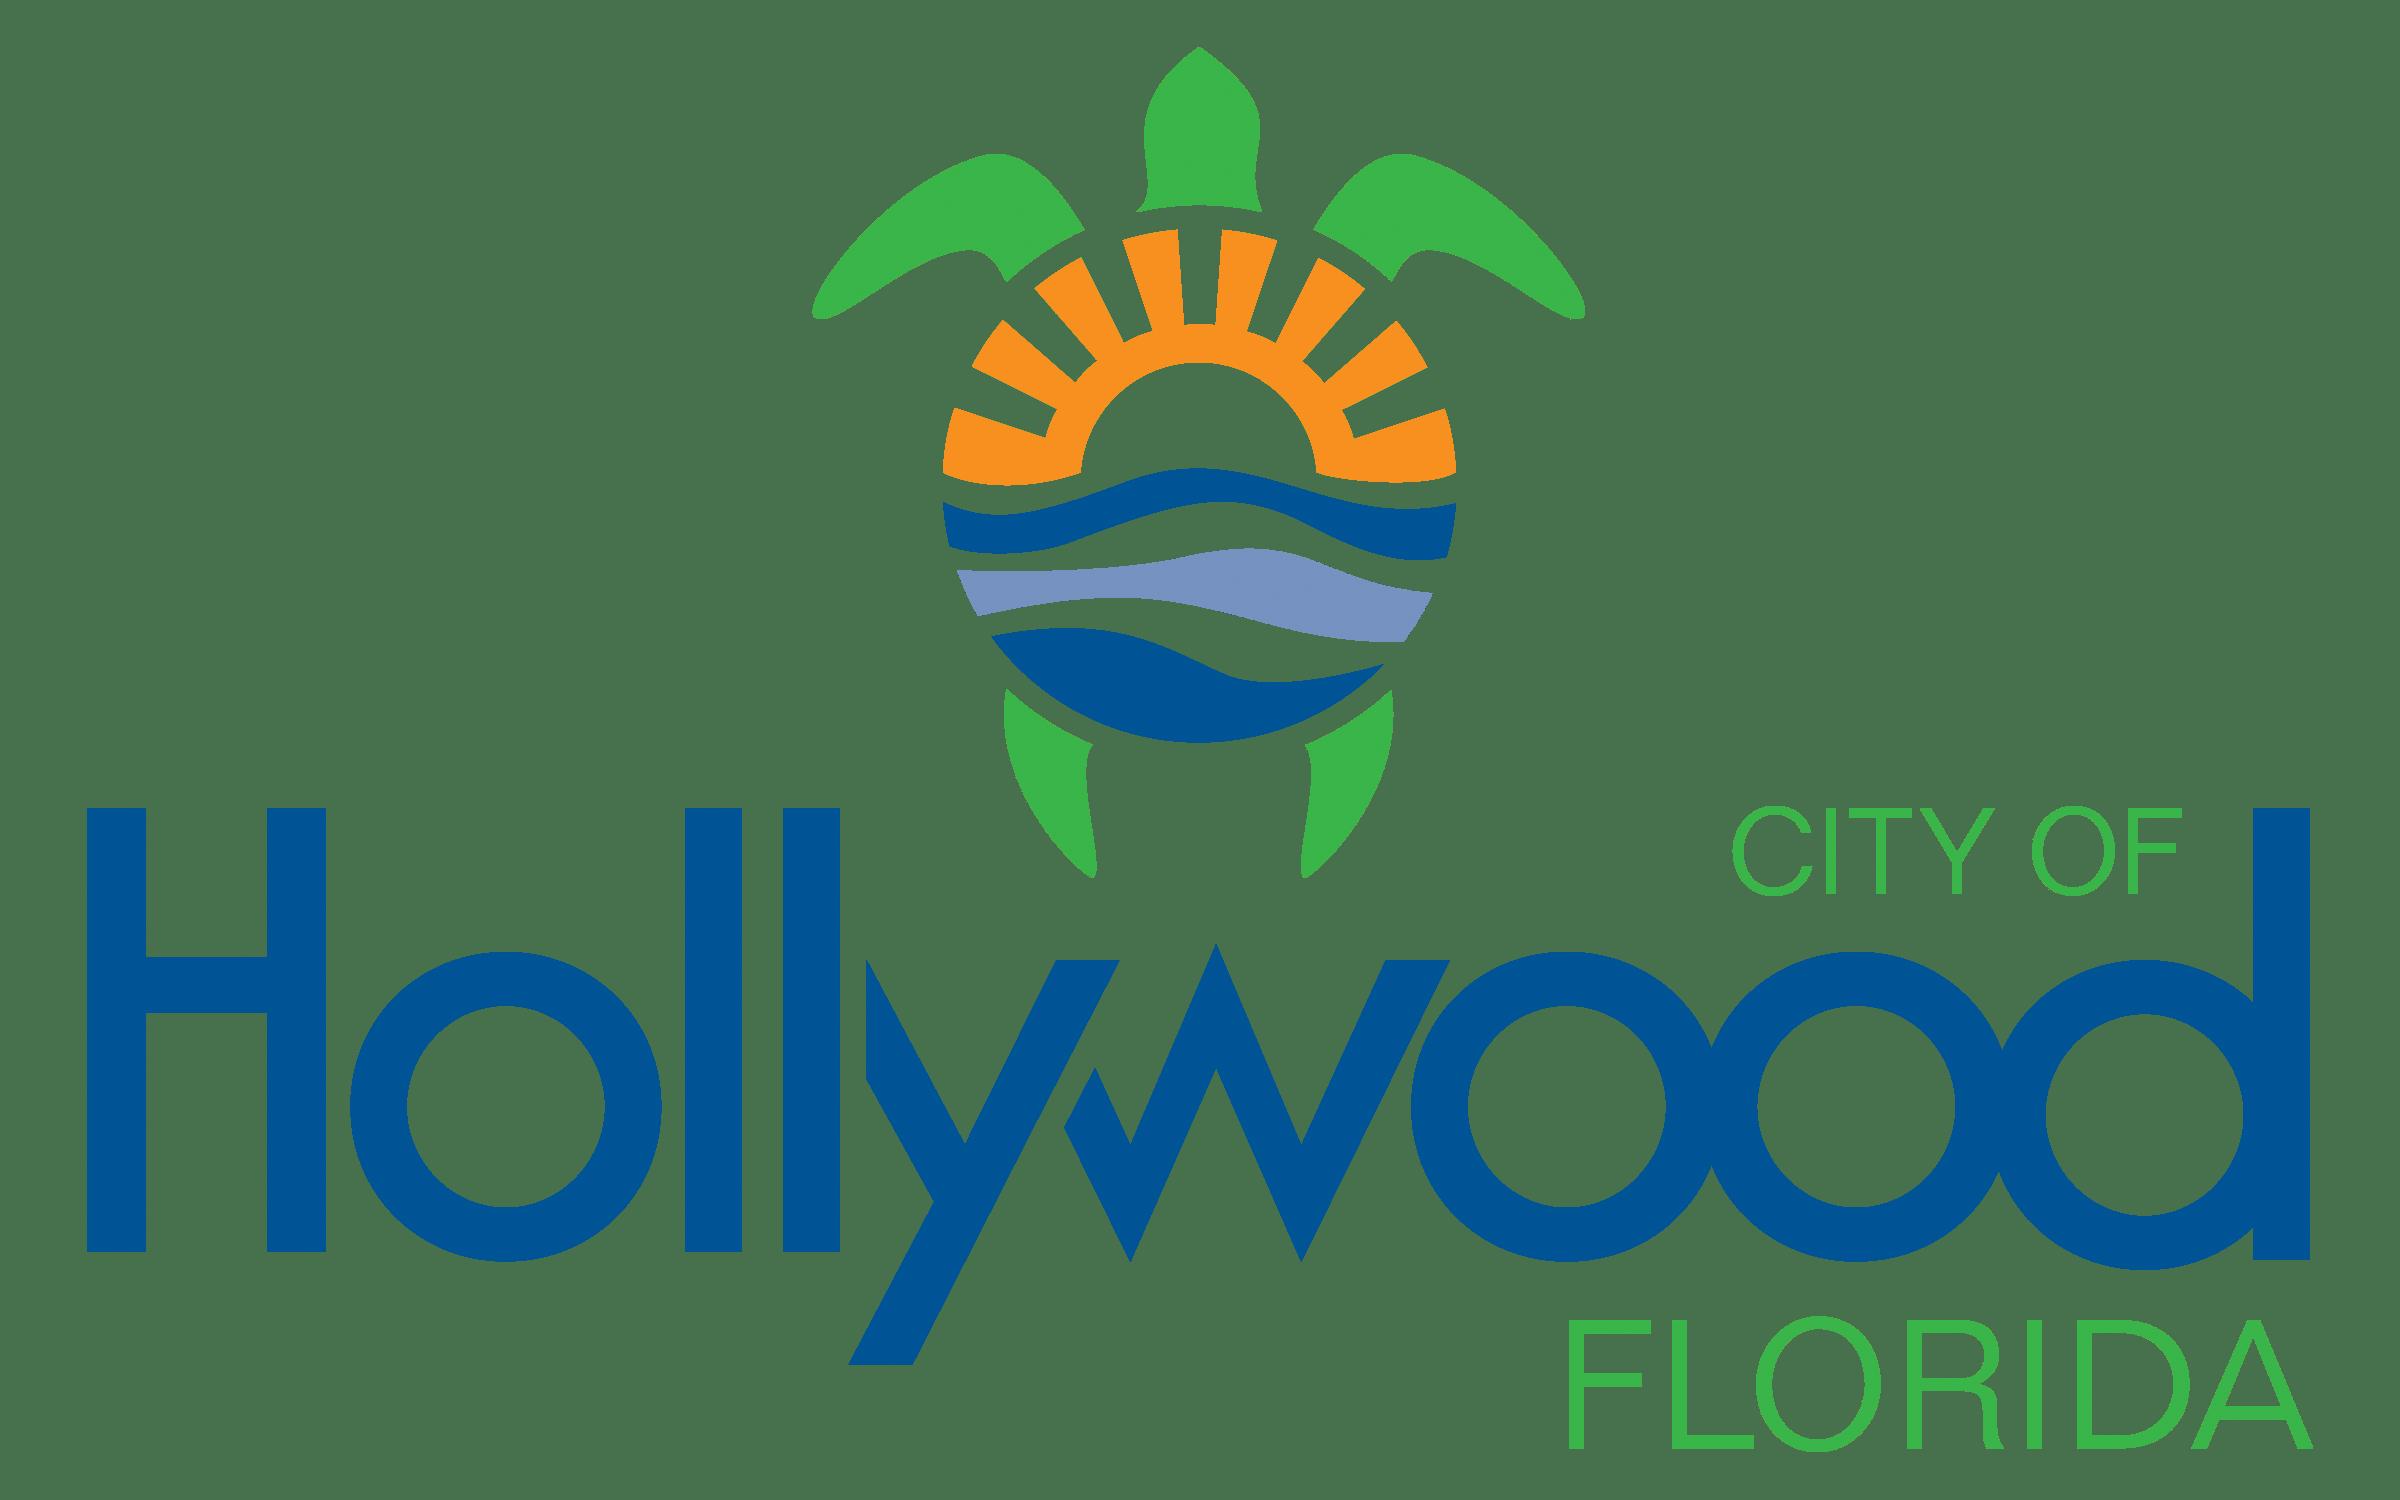 City of Hollywood Florida Logo